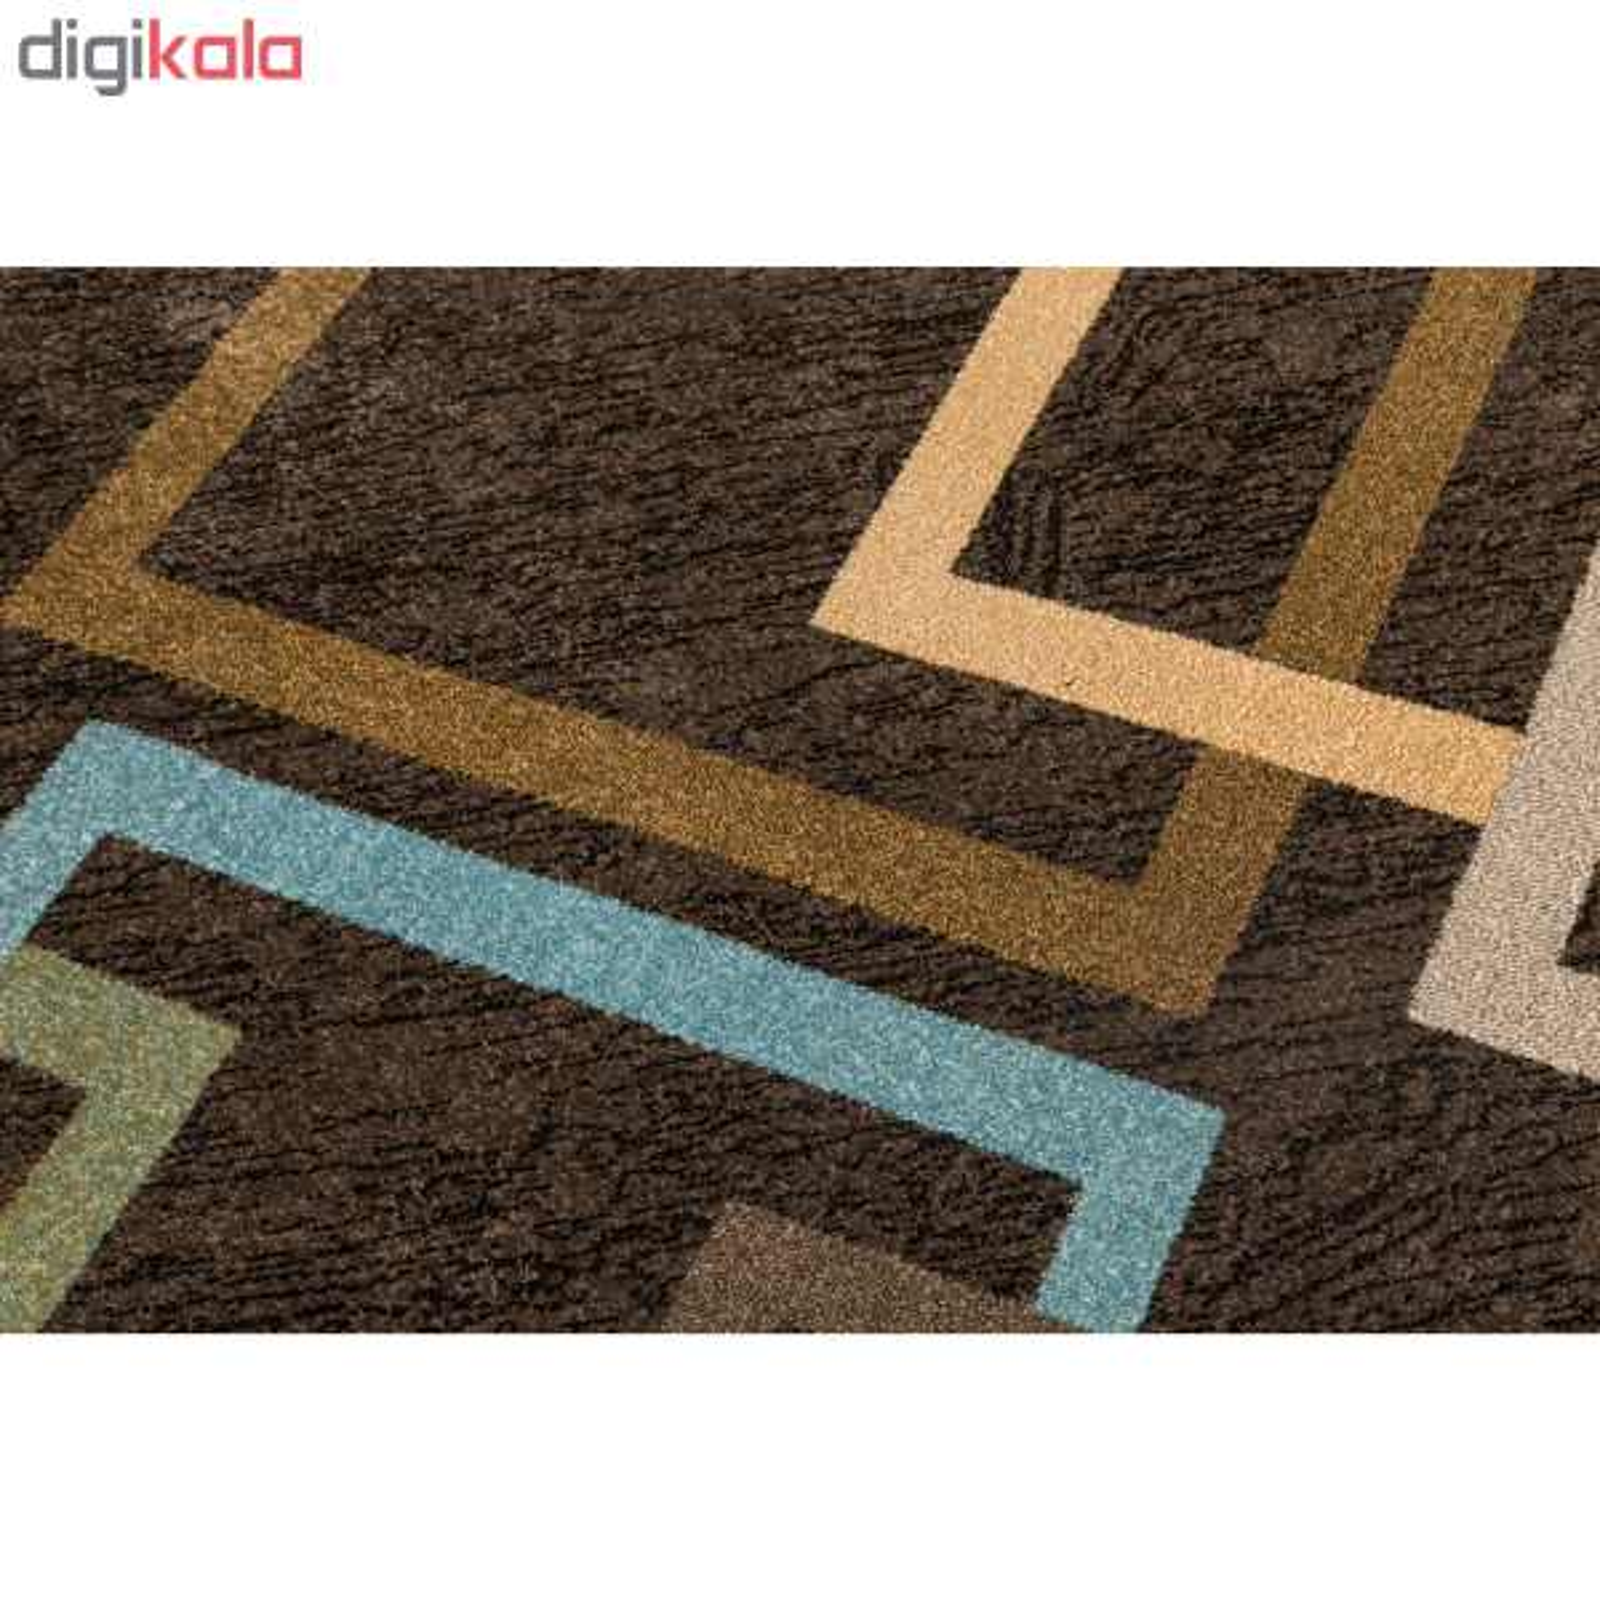 فرش ماشینی ساوین طرح ۴۰۰۳ زمینه نسکافه ای main 1 2